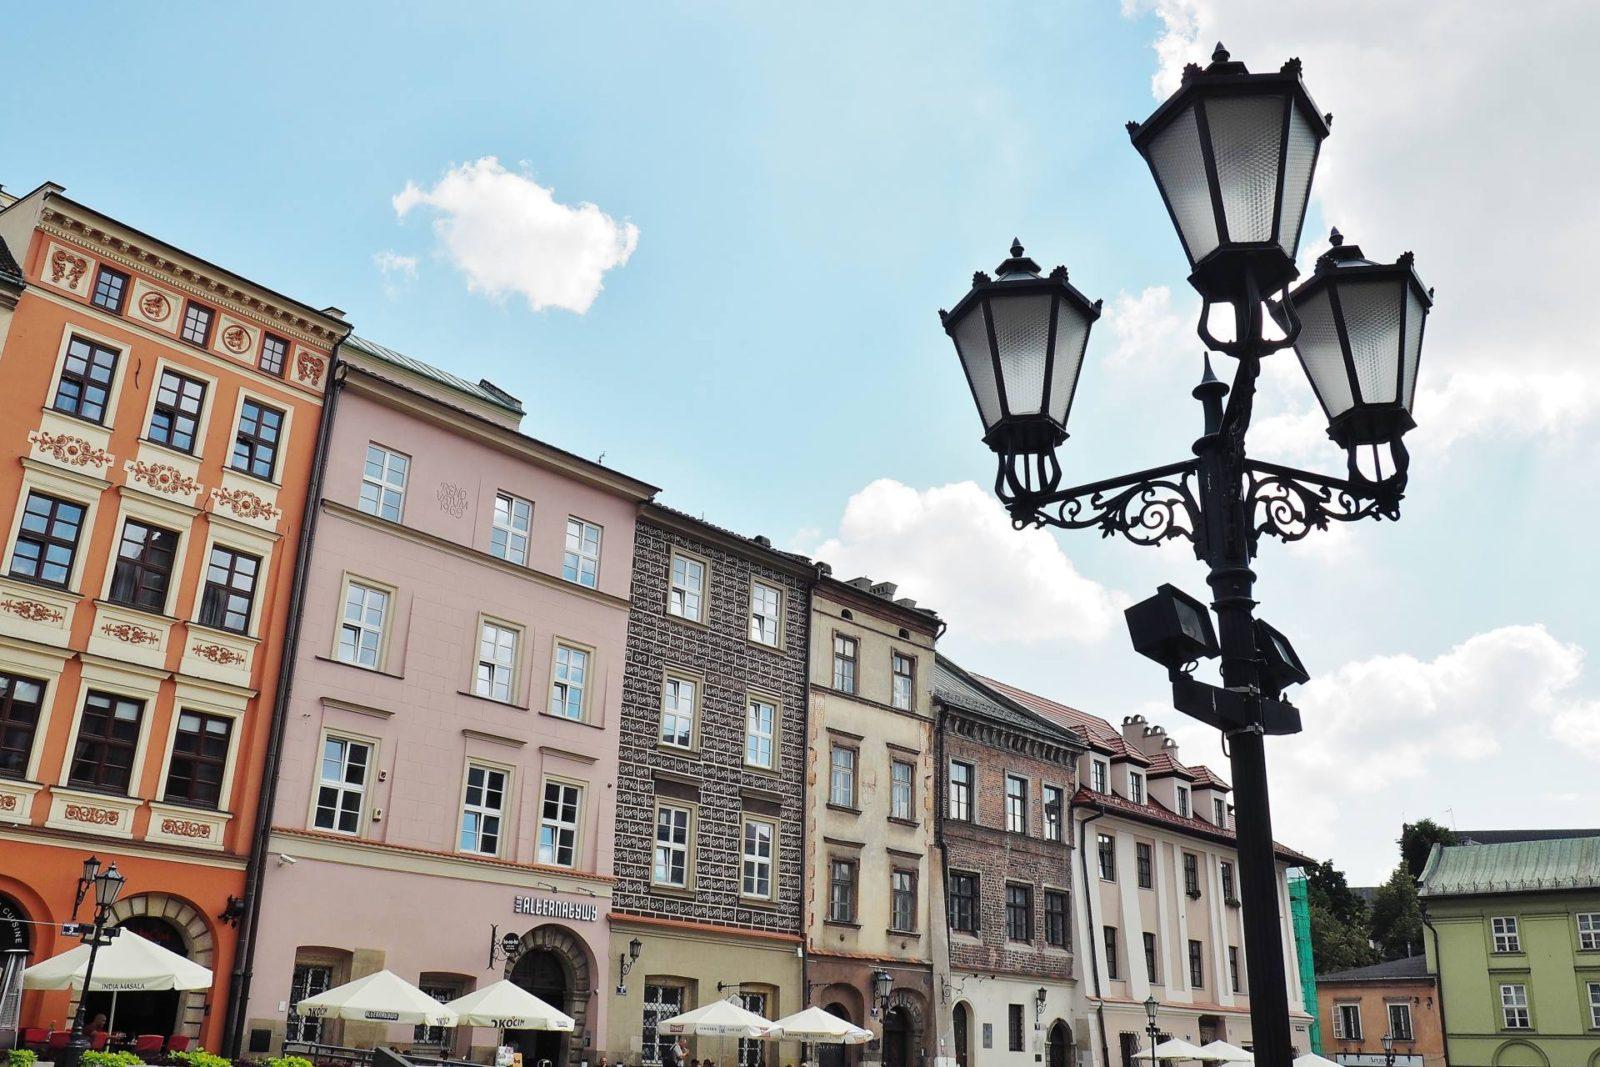 Emma Victoria Stokes Krakow Old Town Street Lamps